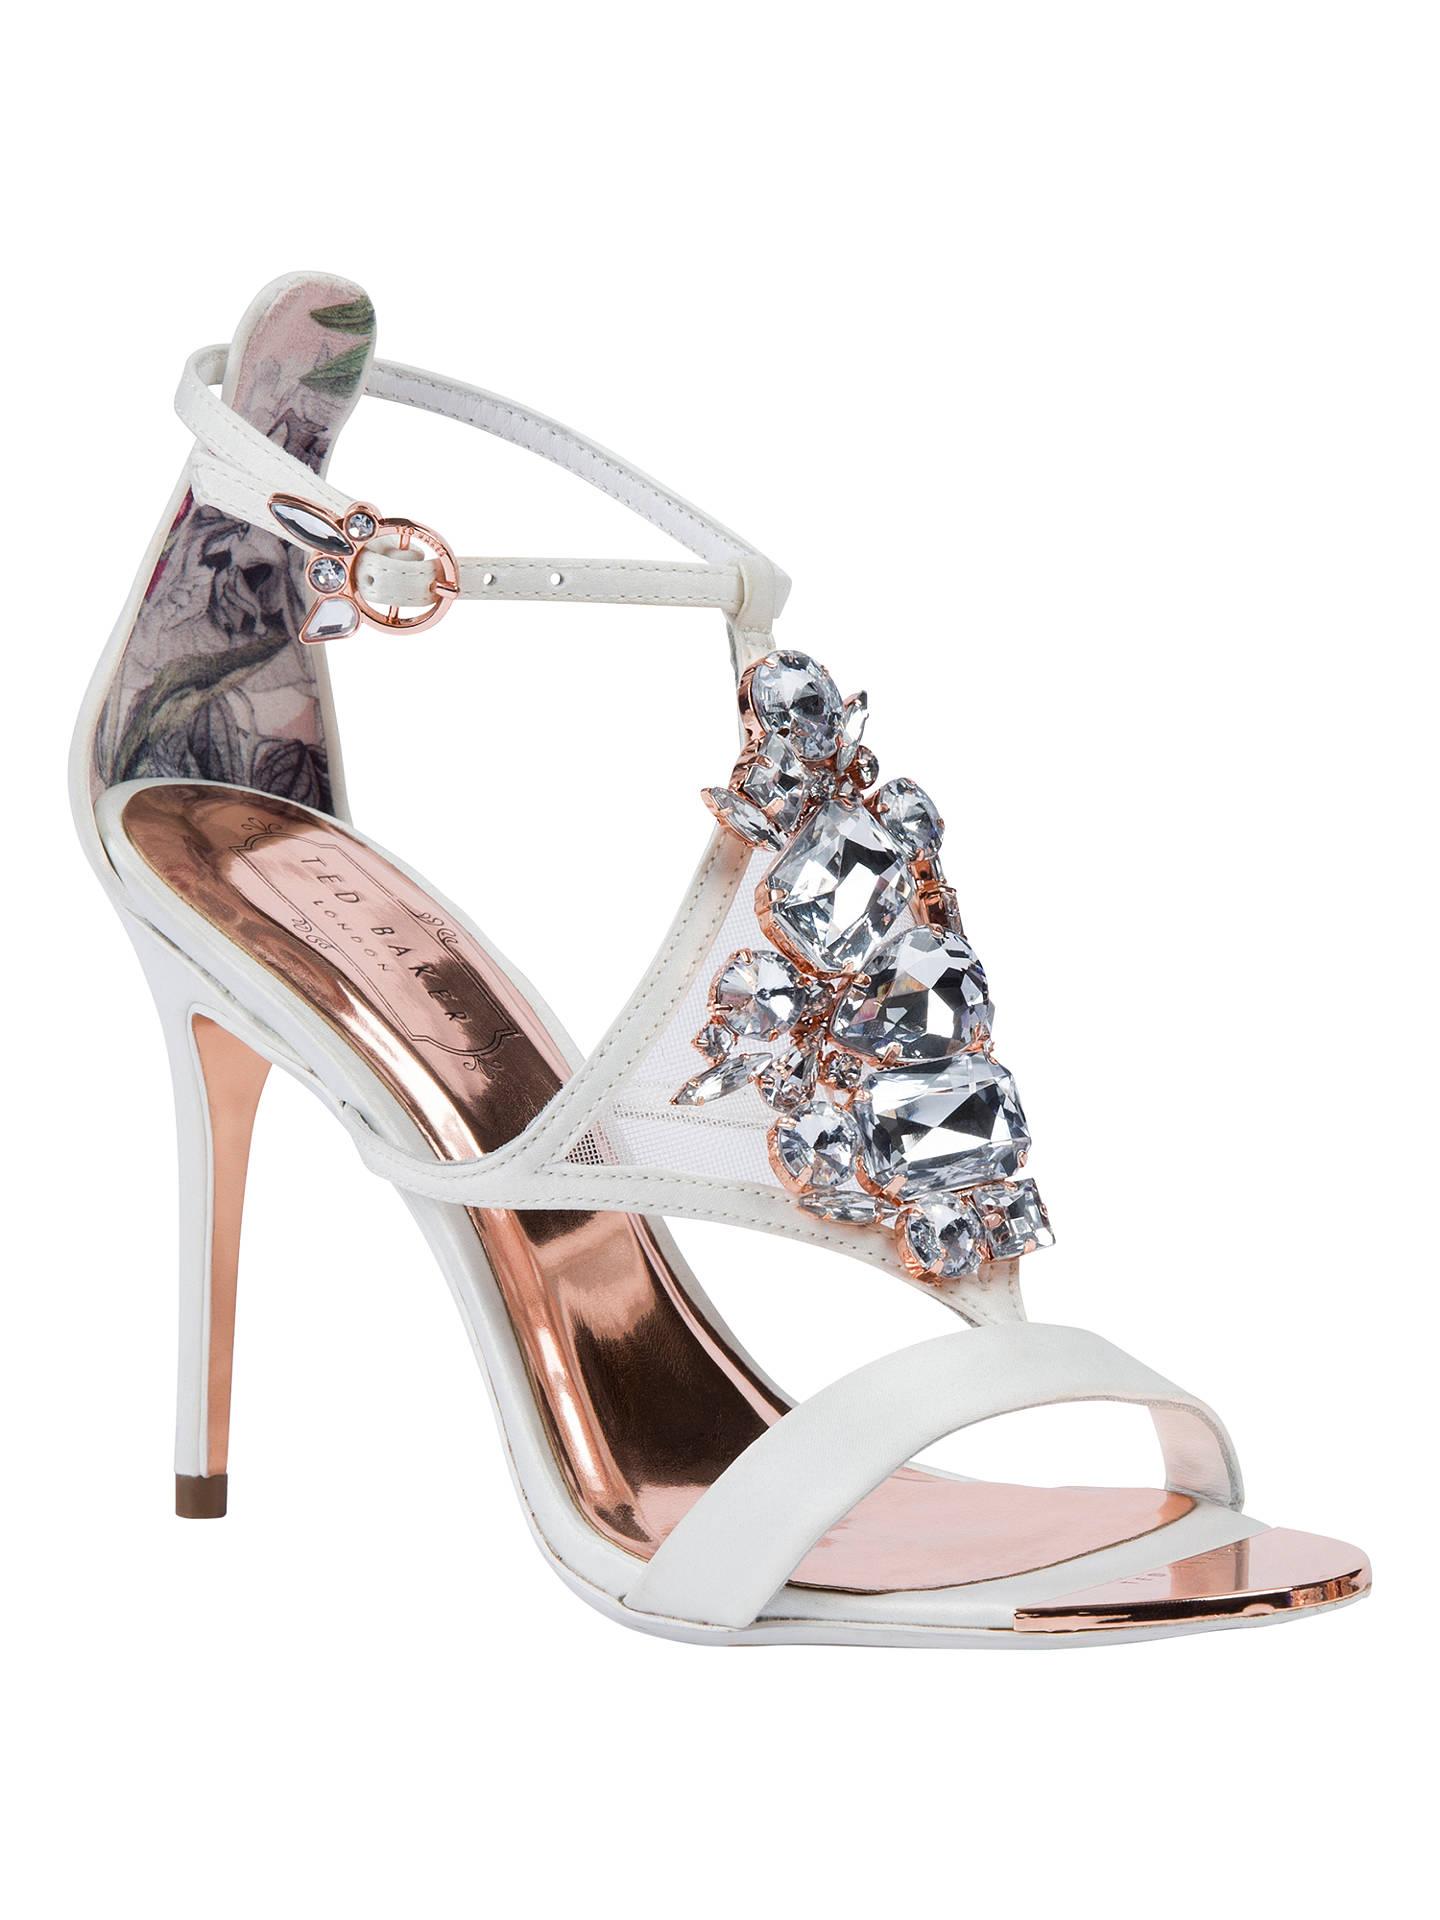 84f0ed6ce80a5f Buy Ted Baker Liosa Embellished Stiletto Heel Sandals